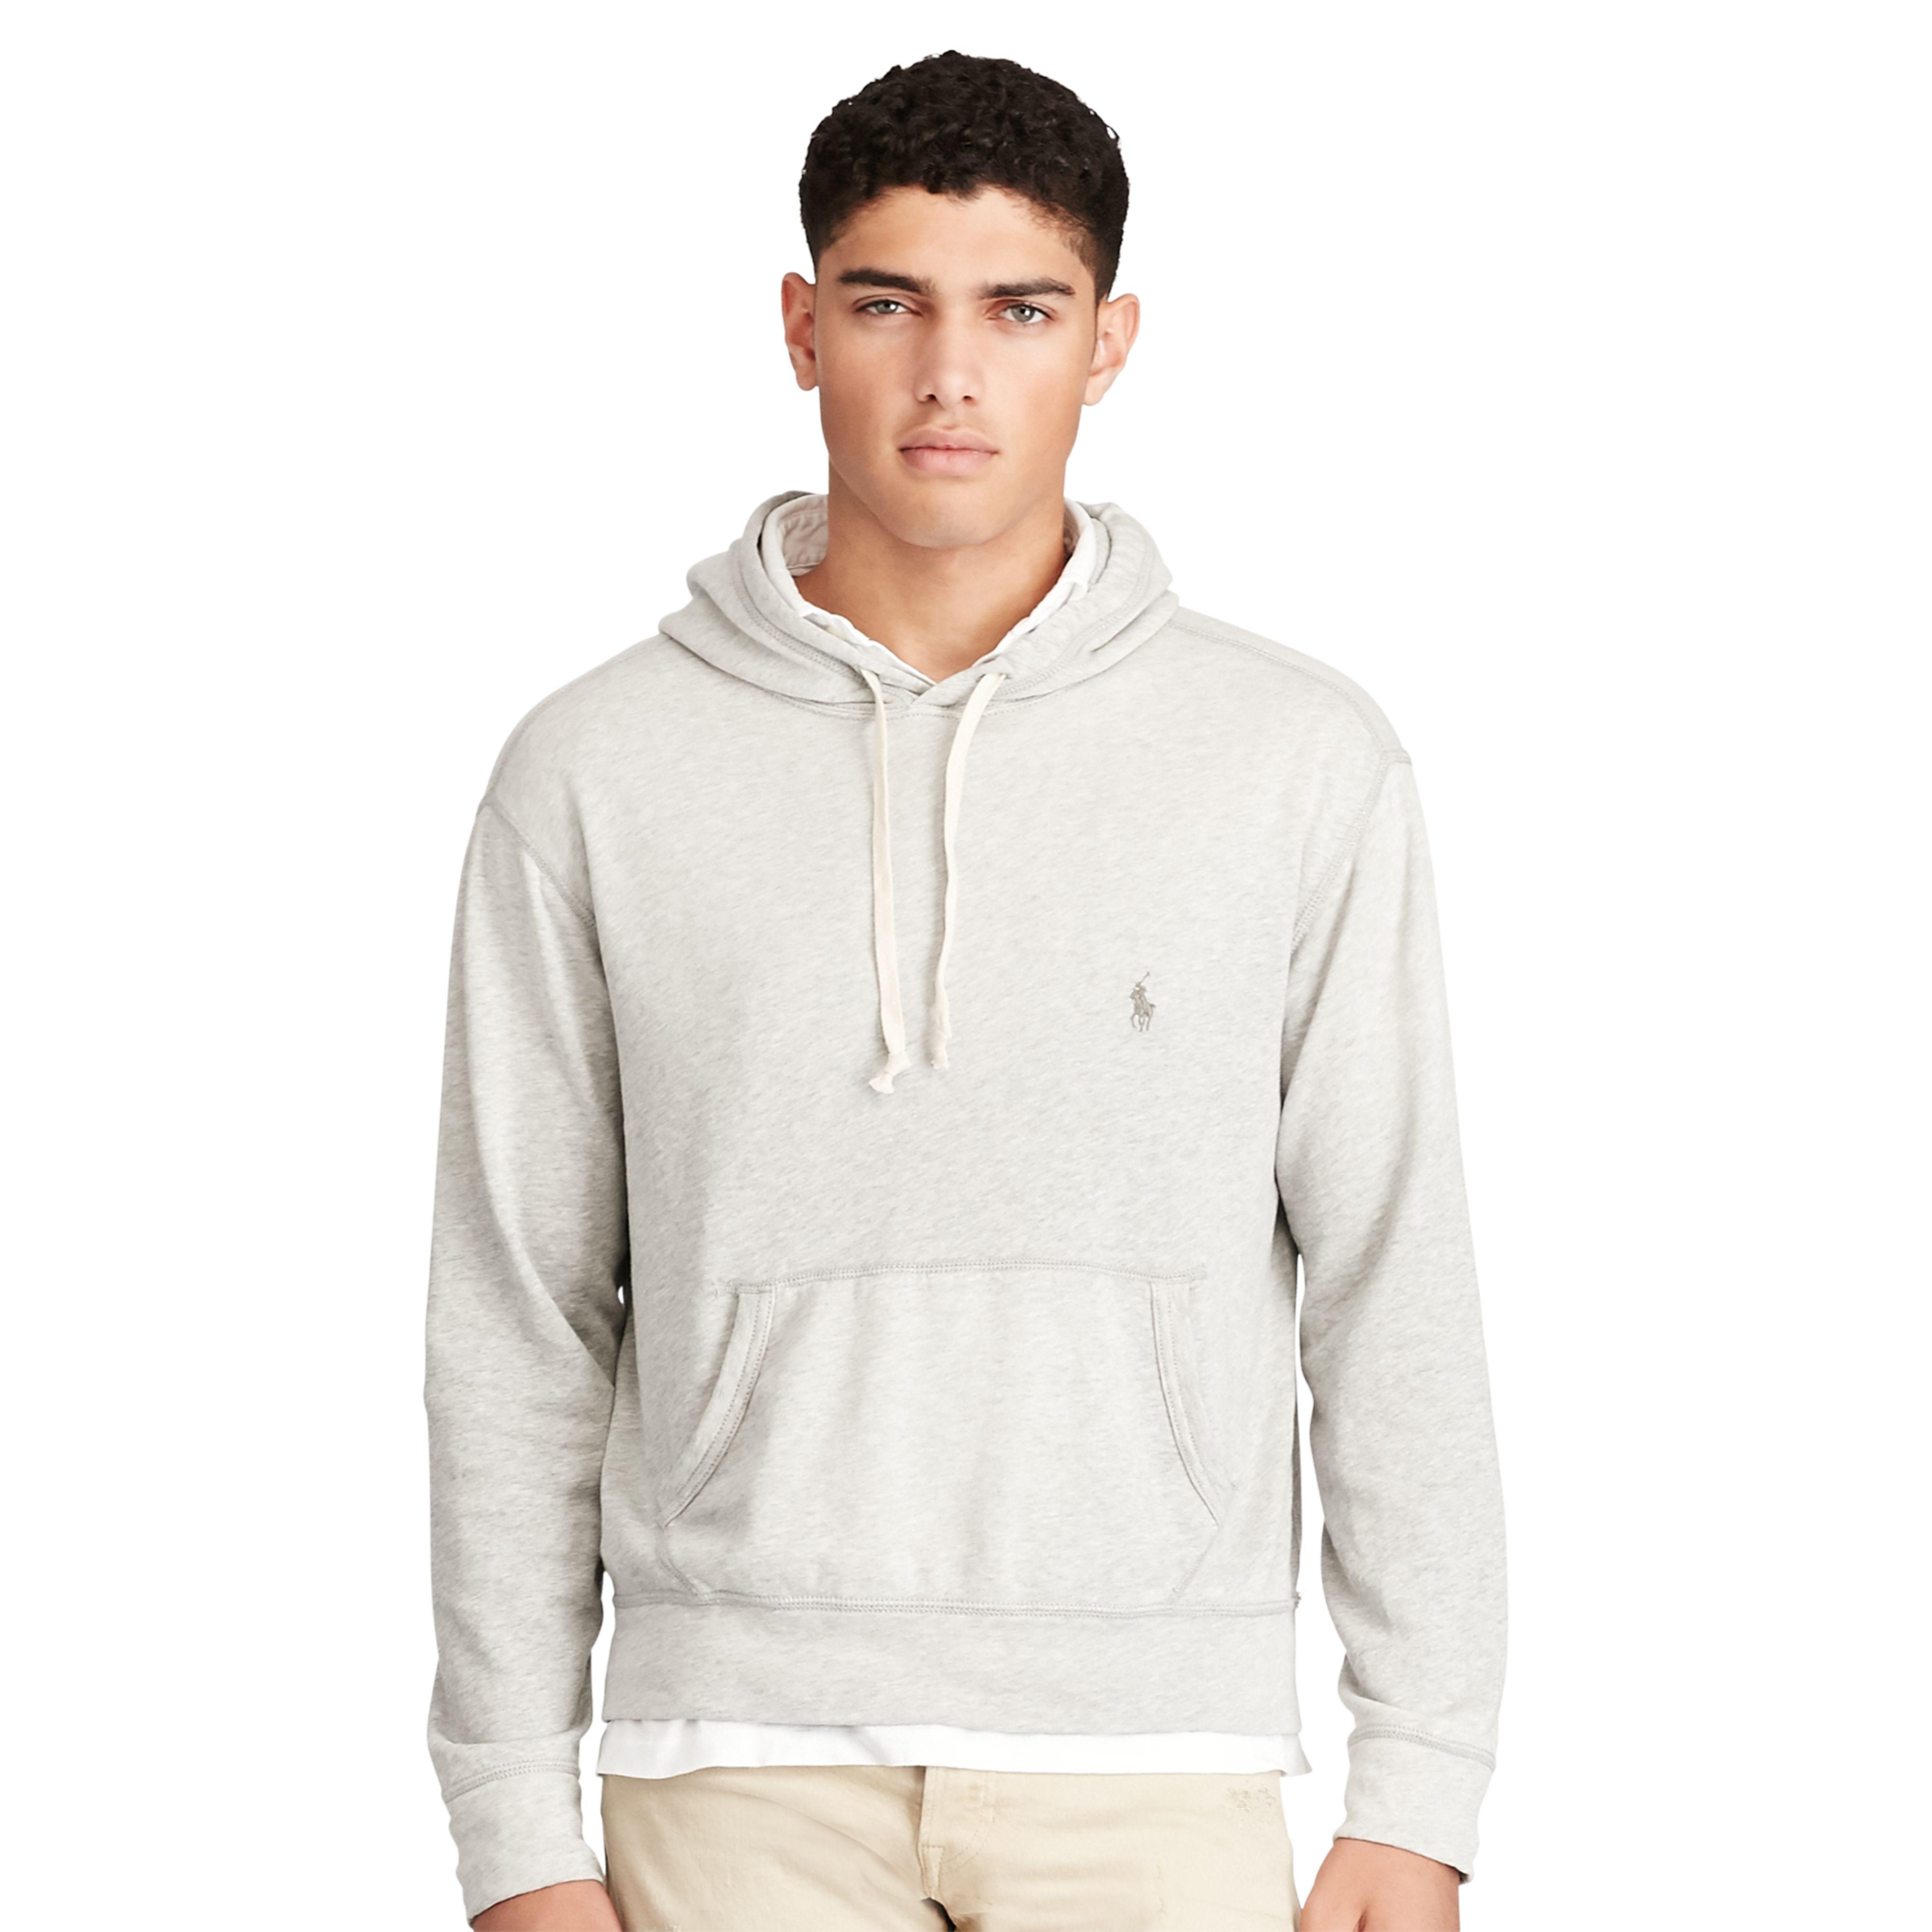 6022b0462a6c Polo Ralph Lauren Mens Cotton Spa French Terry Sweatshirt